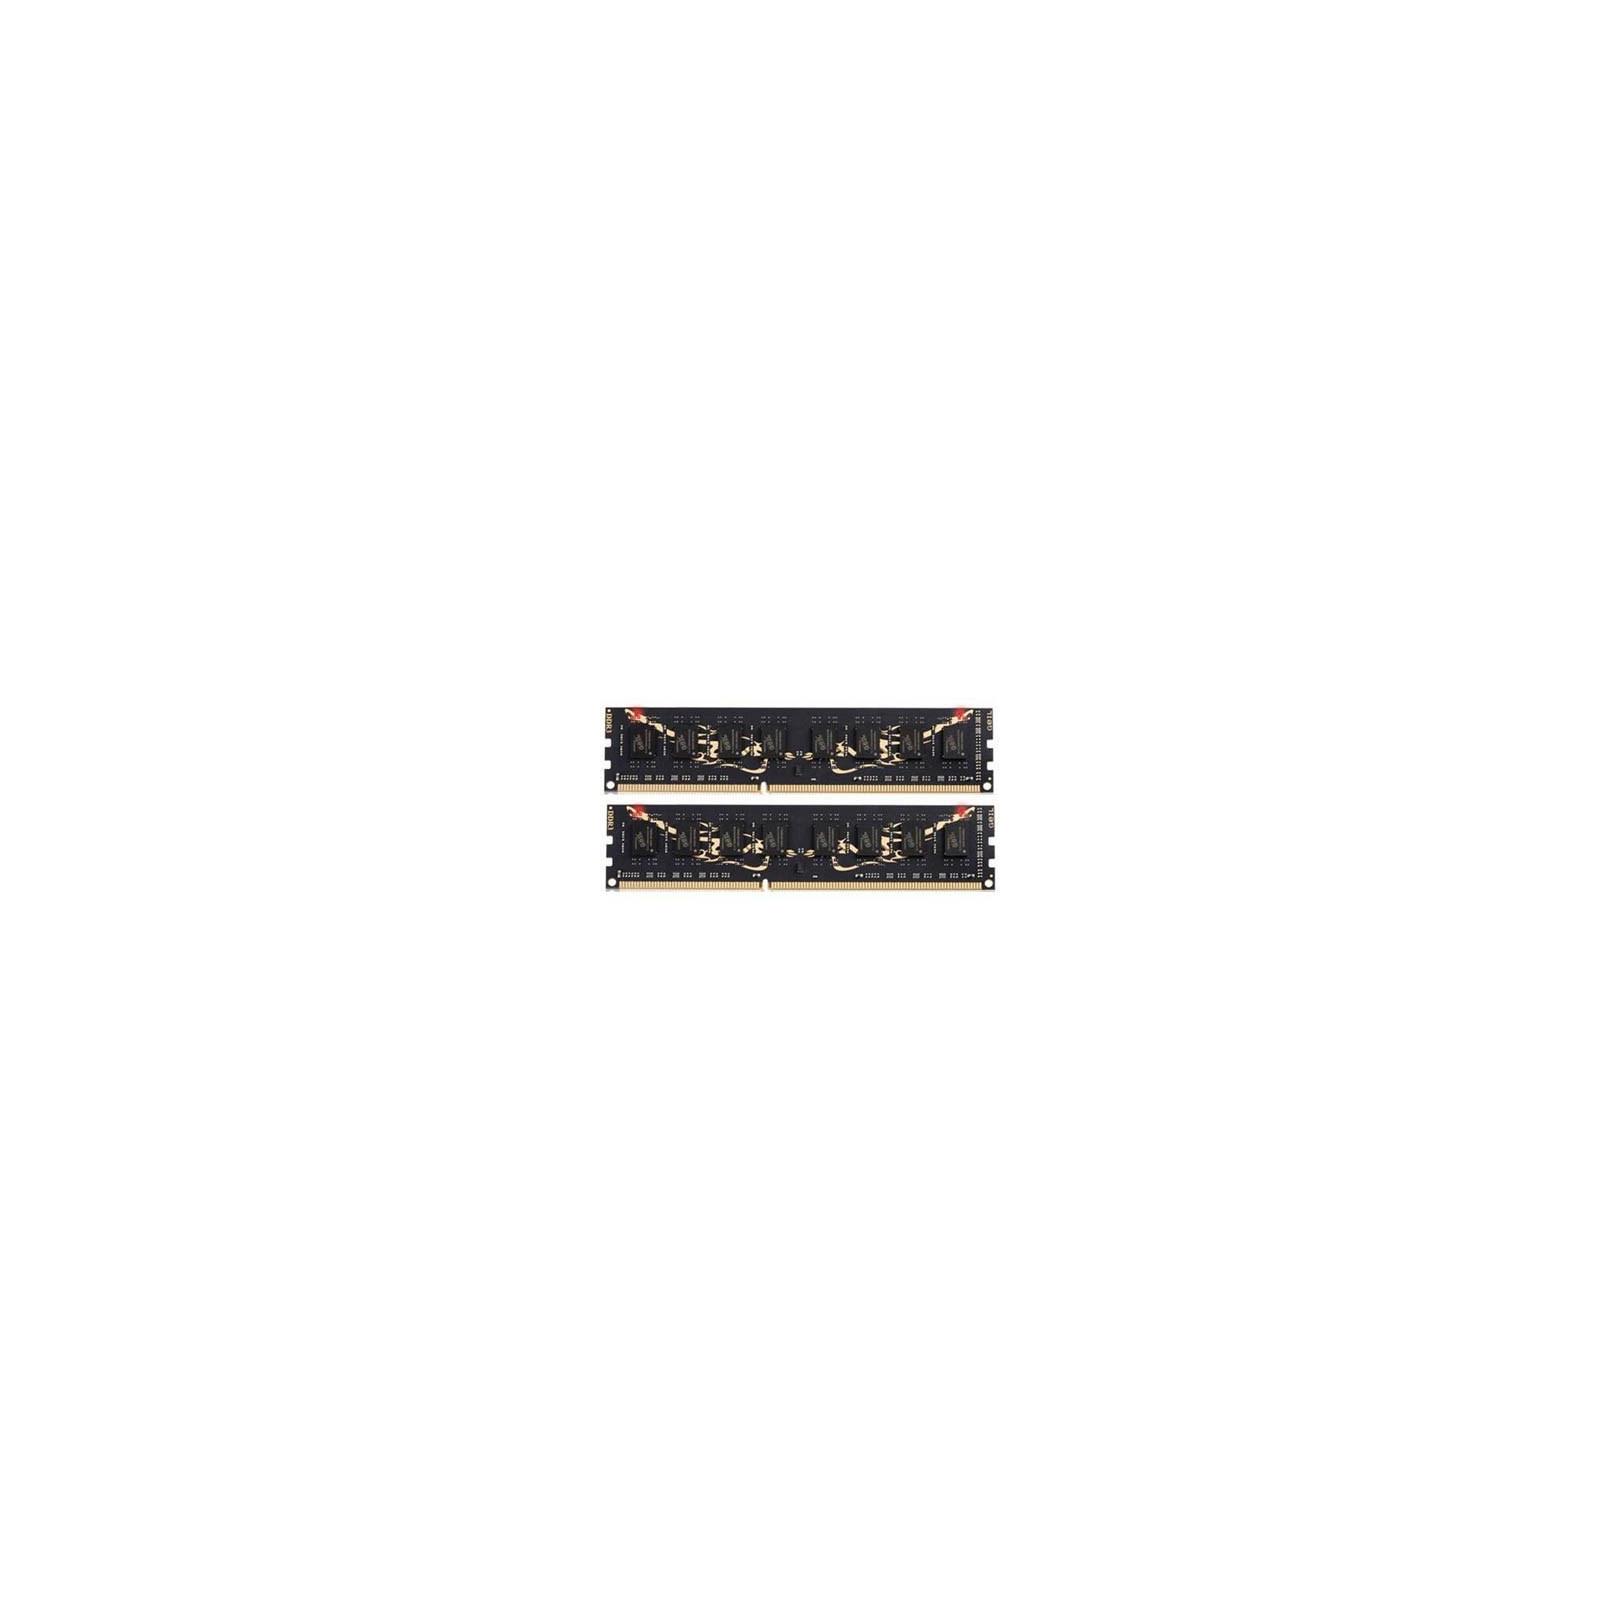 Модуль памяти для компьютера DDR3 8GB (2x4GB) 1866 MHz GEIL (GB38GB1866C10DC)